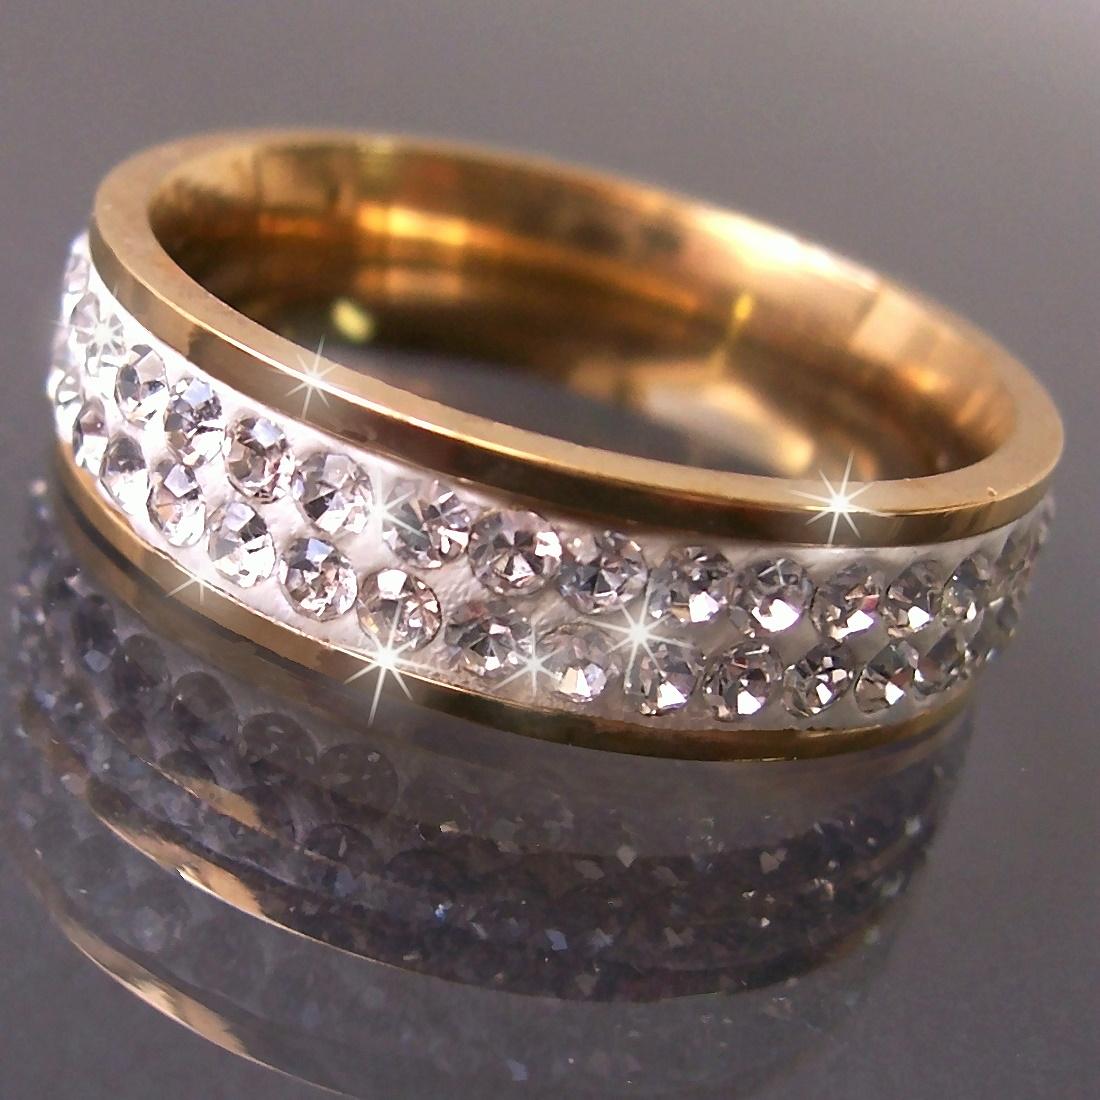 R509-18 Ring Edelstahl mit Gold plattiert Strass clear 18mm Damen neu